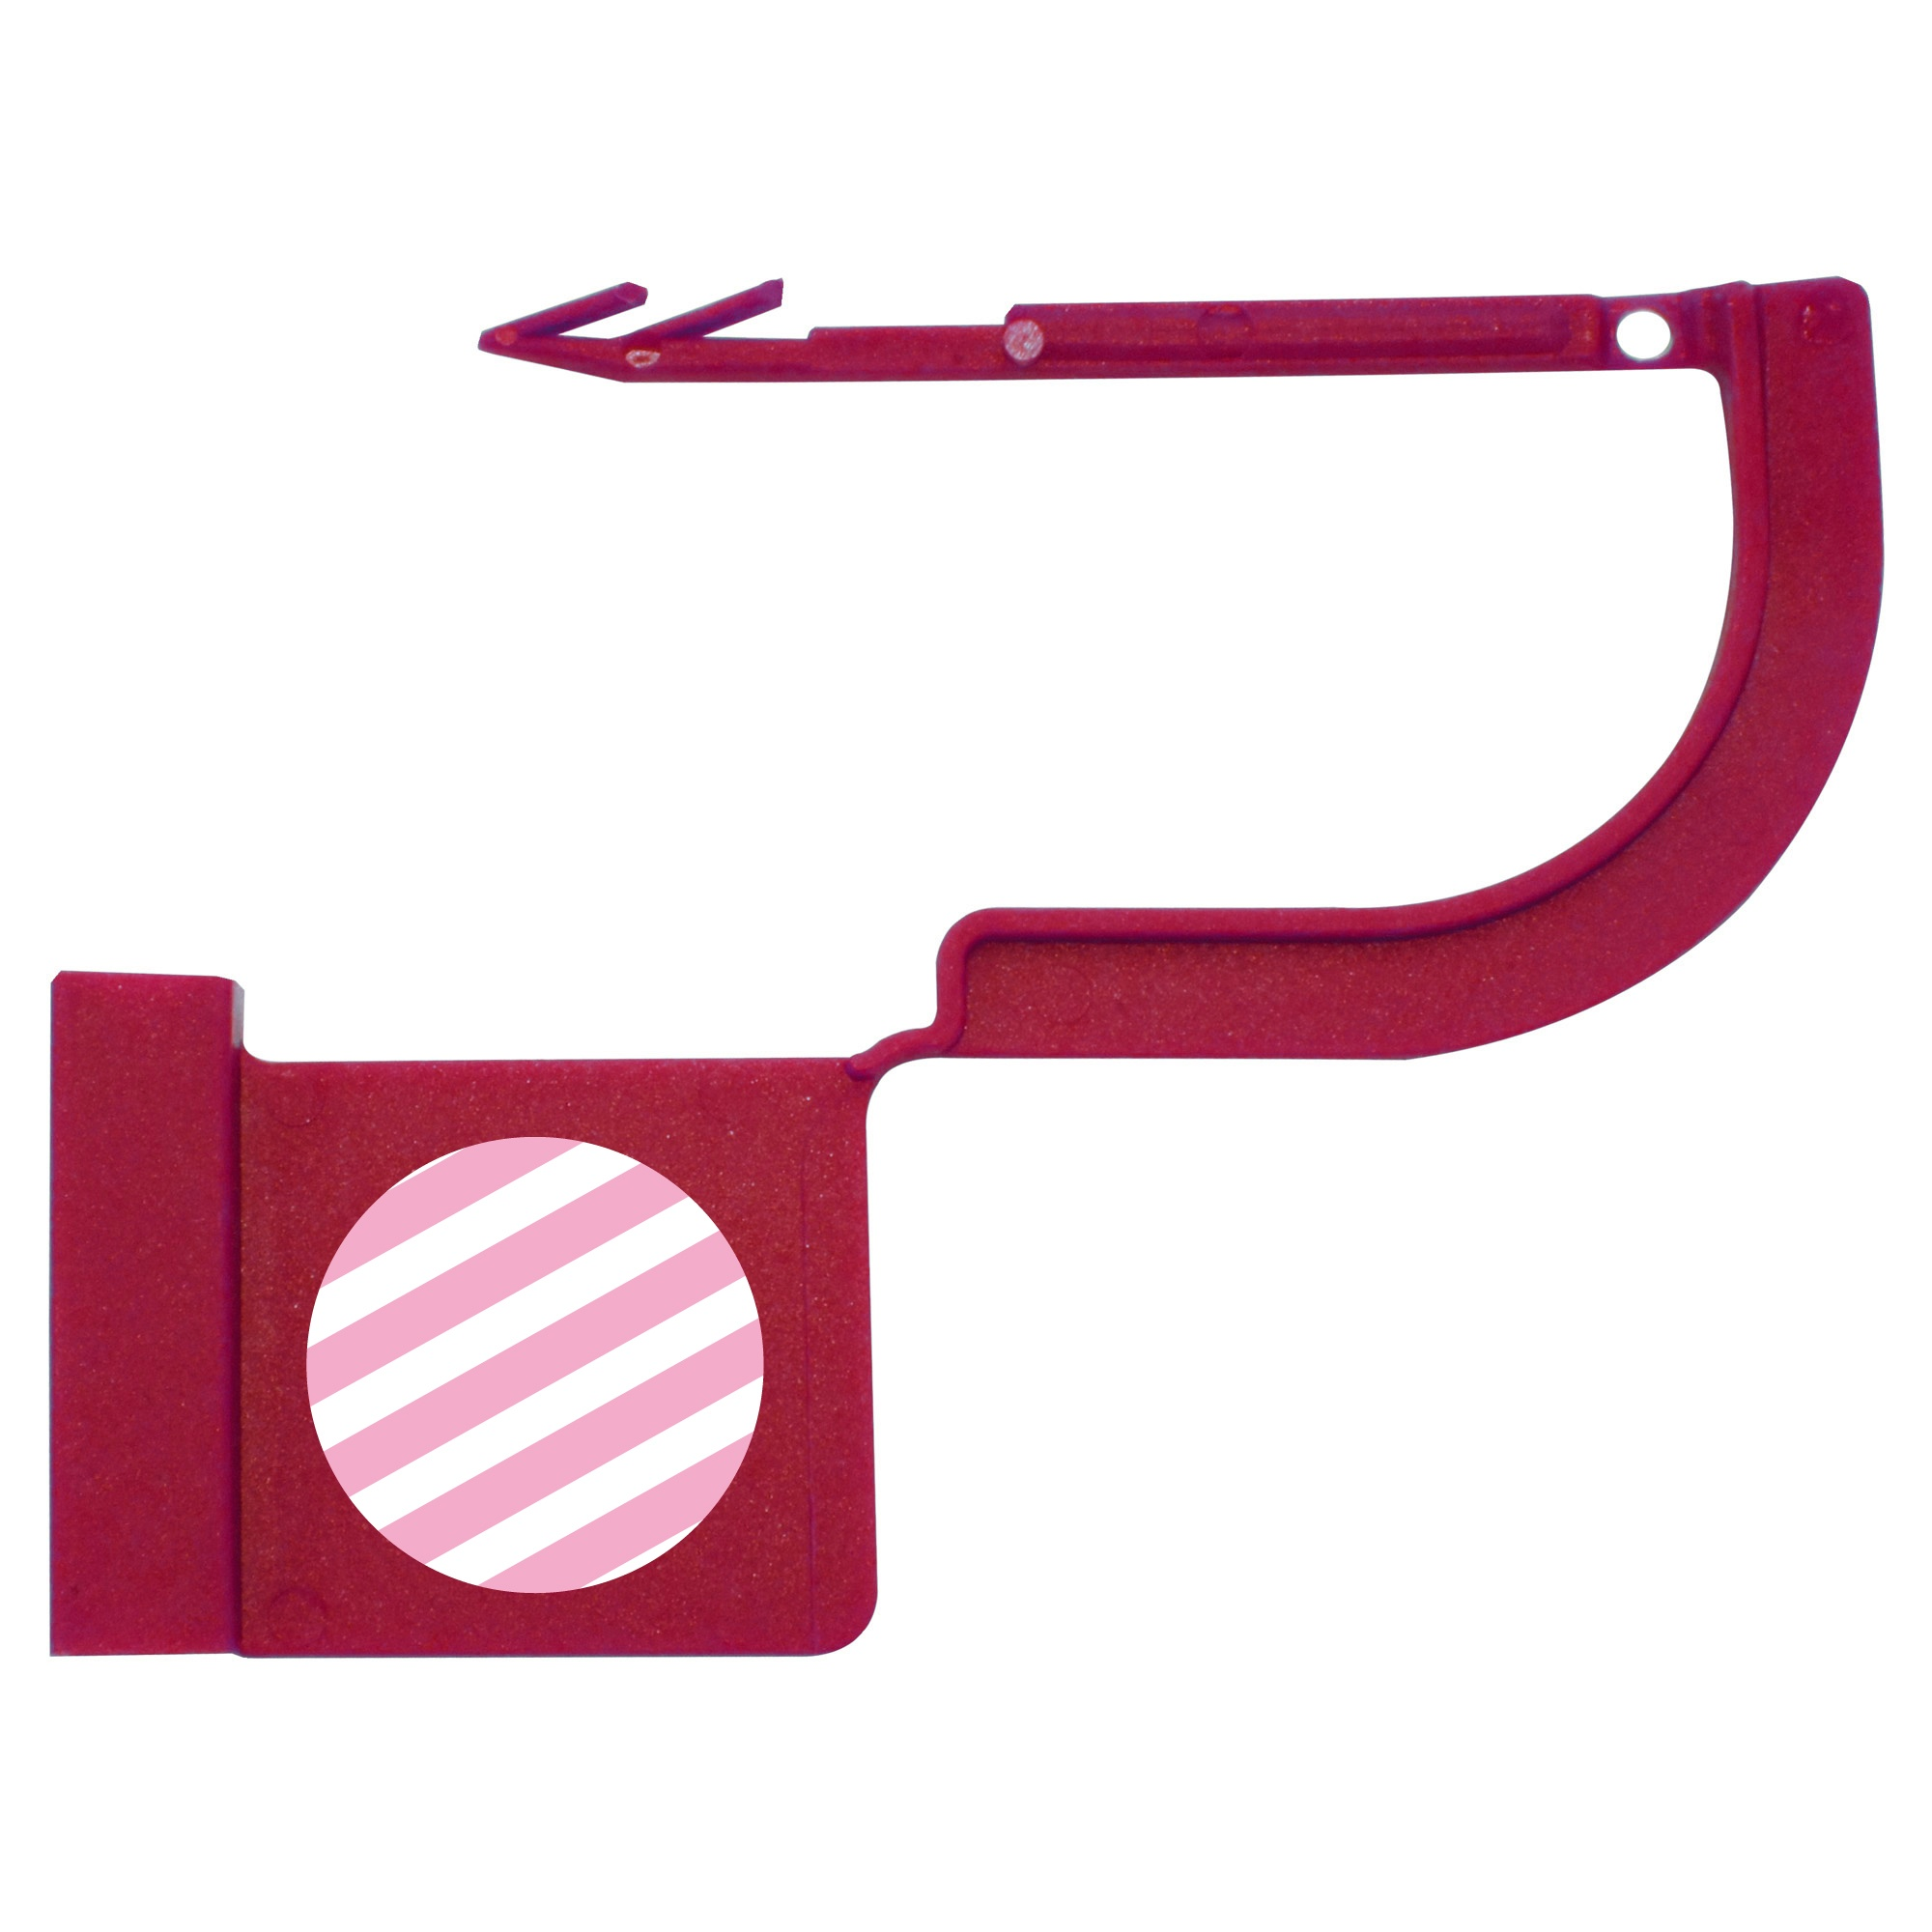 Universal Plastic Seal Unilock Image